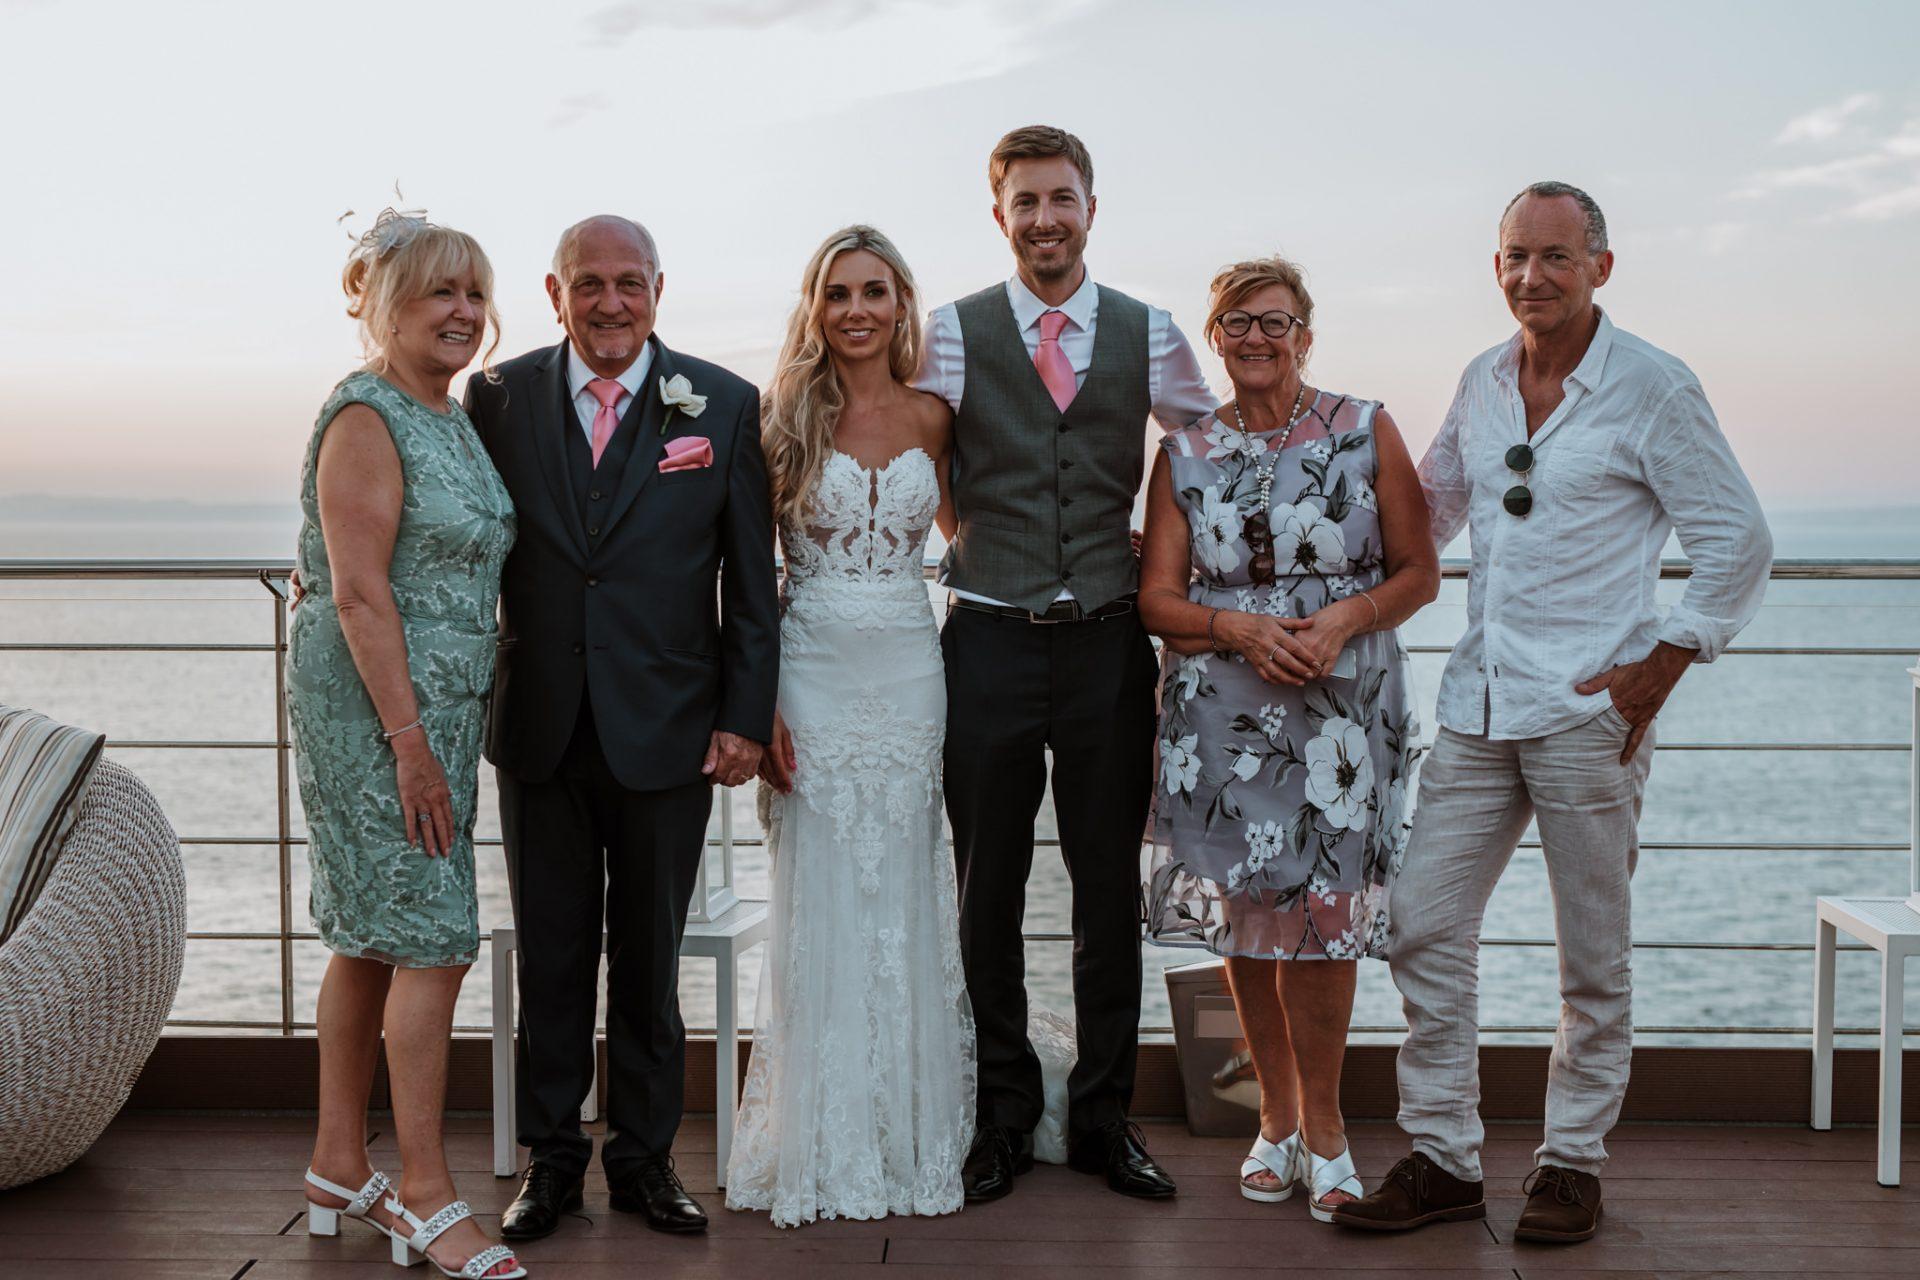 group photo at sunset hotel mediterraneo sorrento